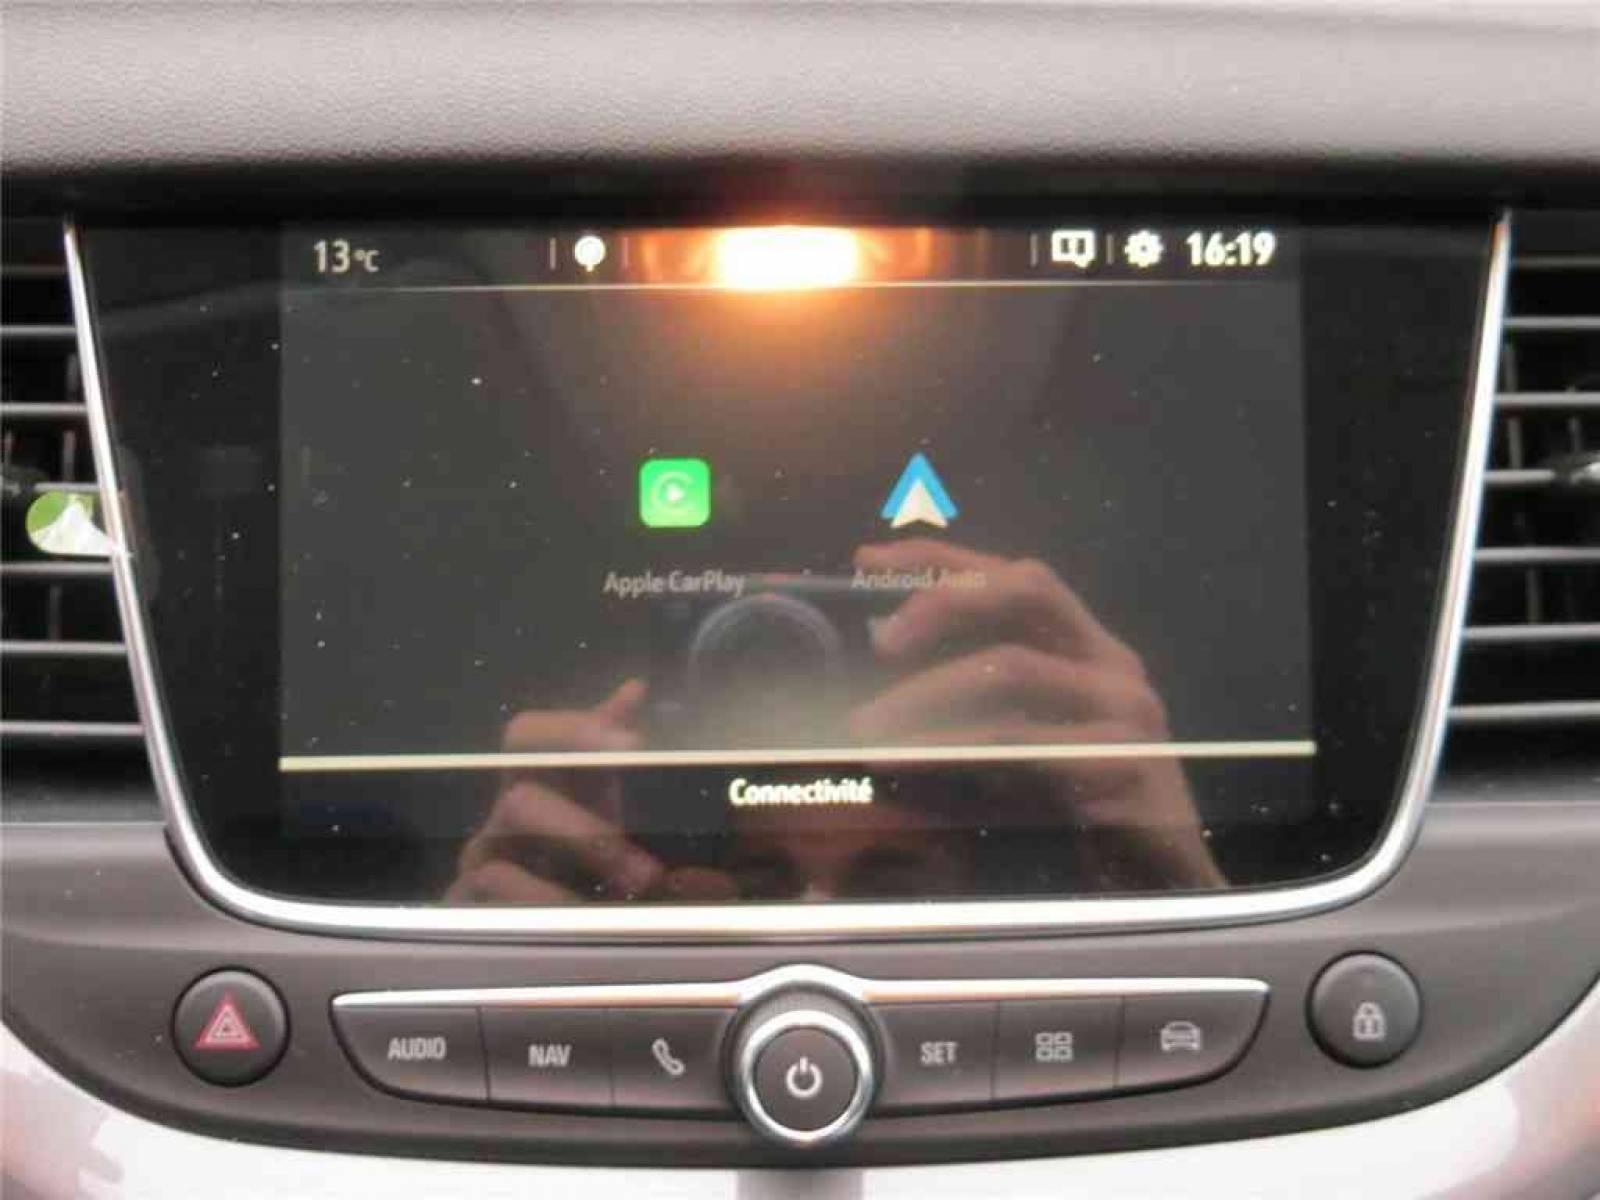 OPEL Grandland X 1.5 Diesel 130 ch BVA8 - véhicule d'occasion - Groupe Guillet - Opel Magicauto - Chalon-sur-Saône - 71380 - Saint-Marcel - 30